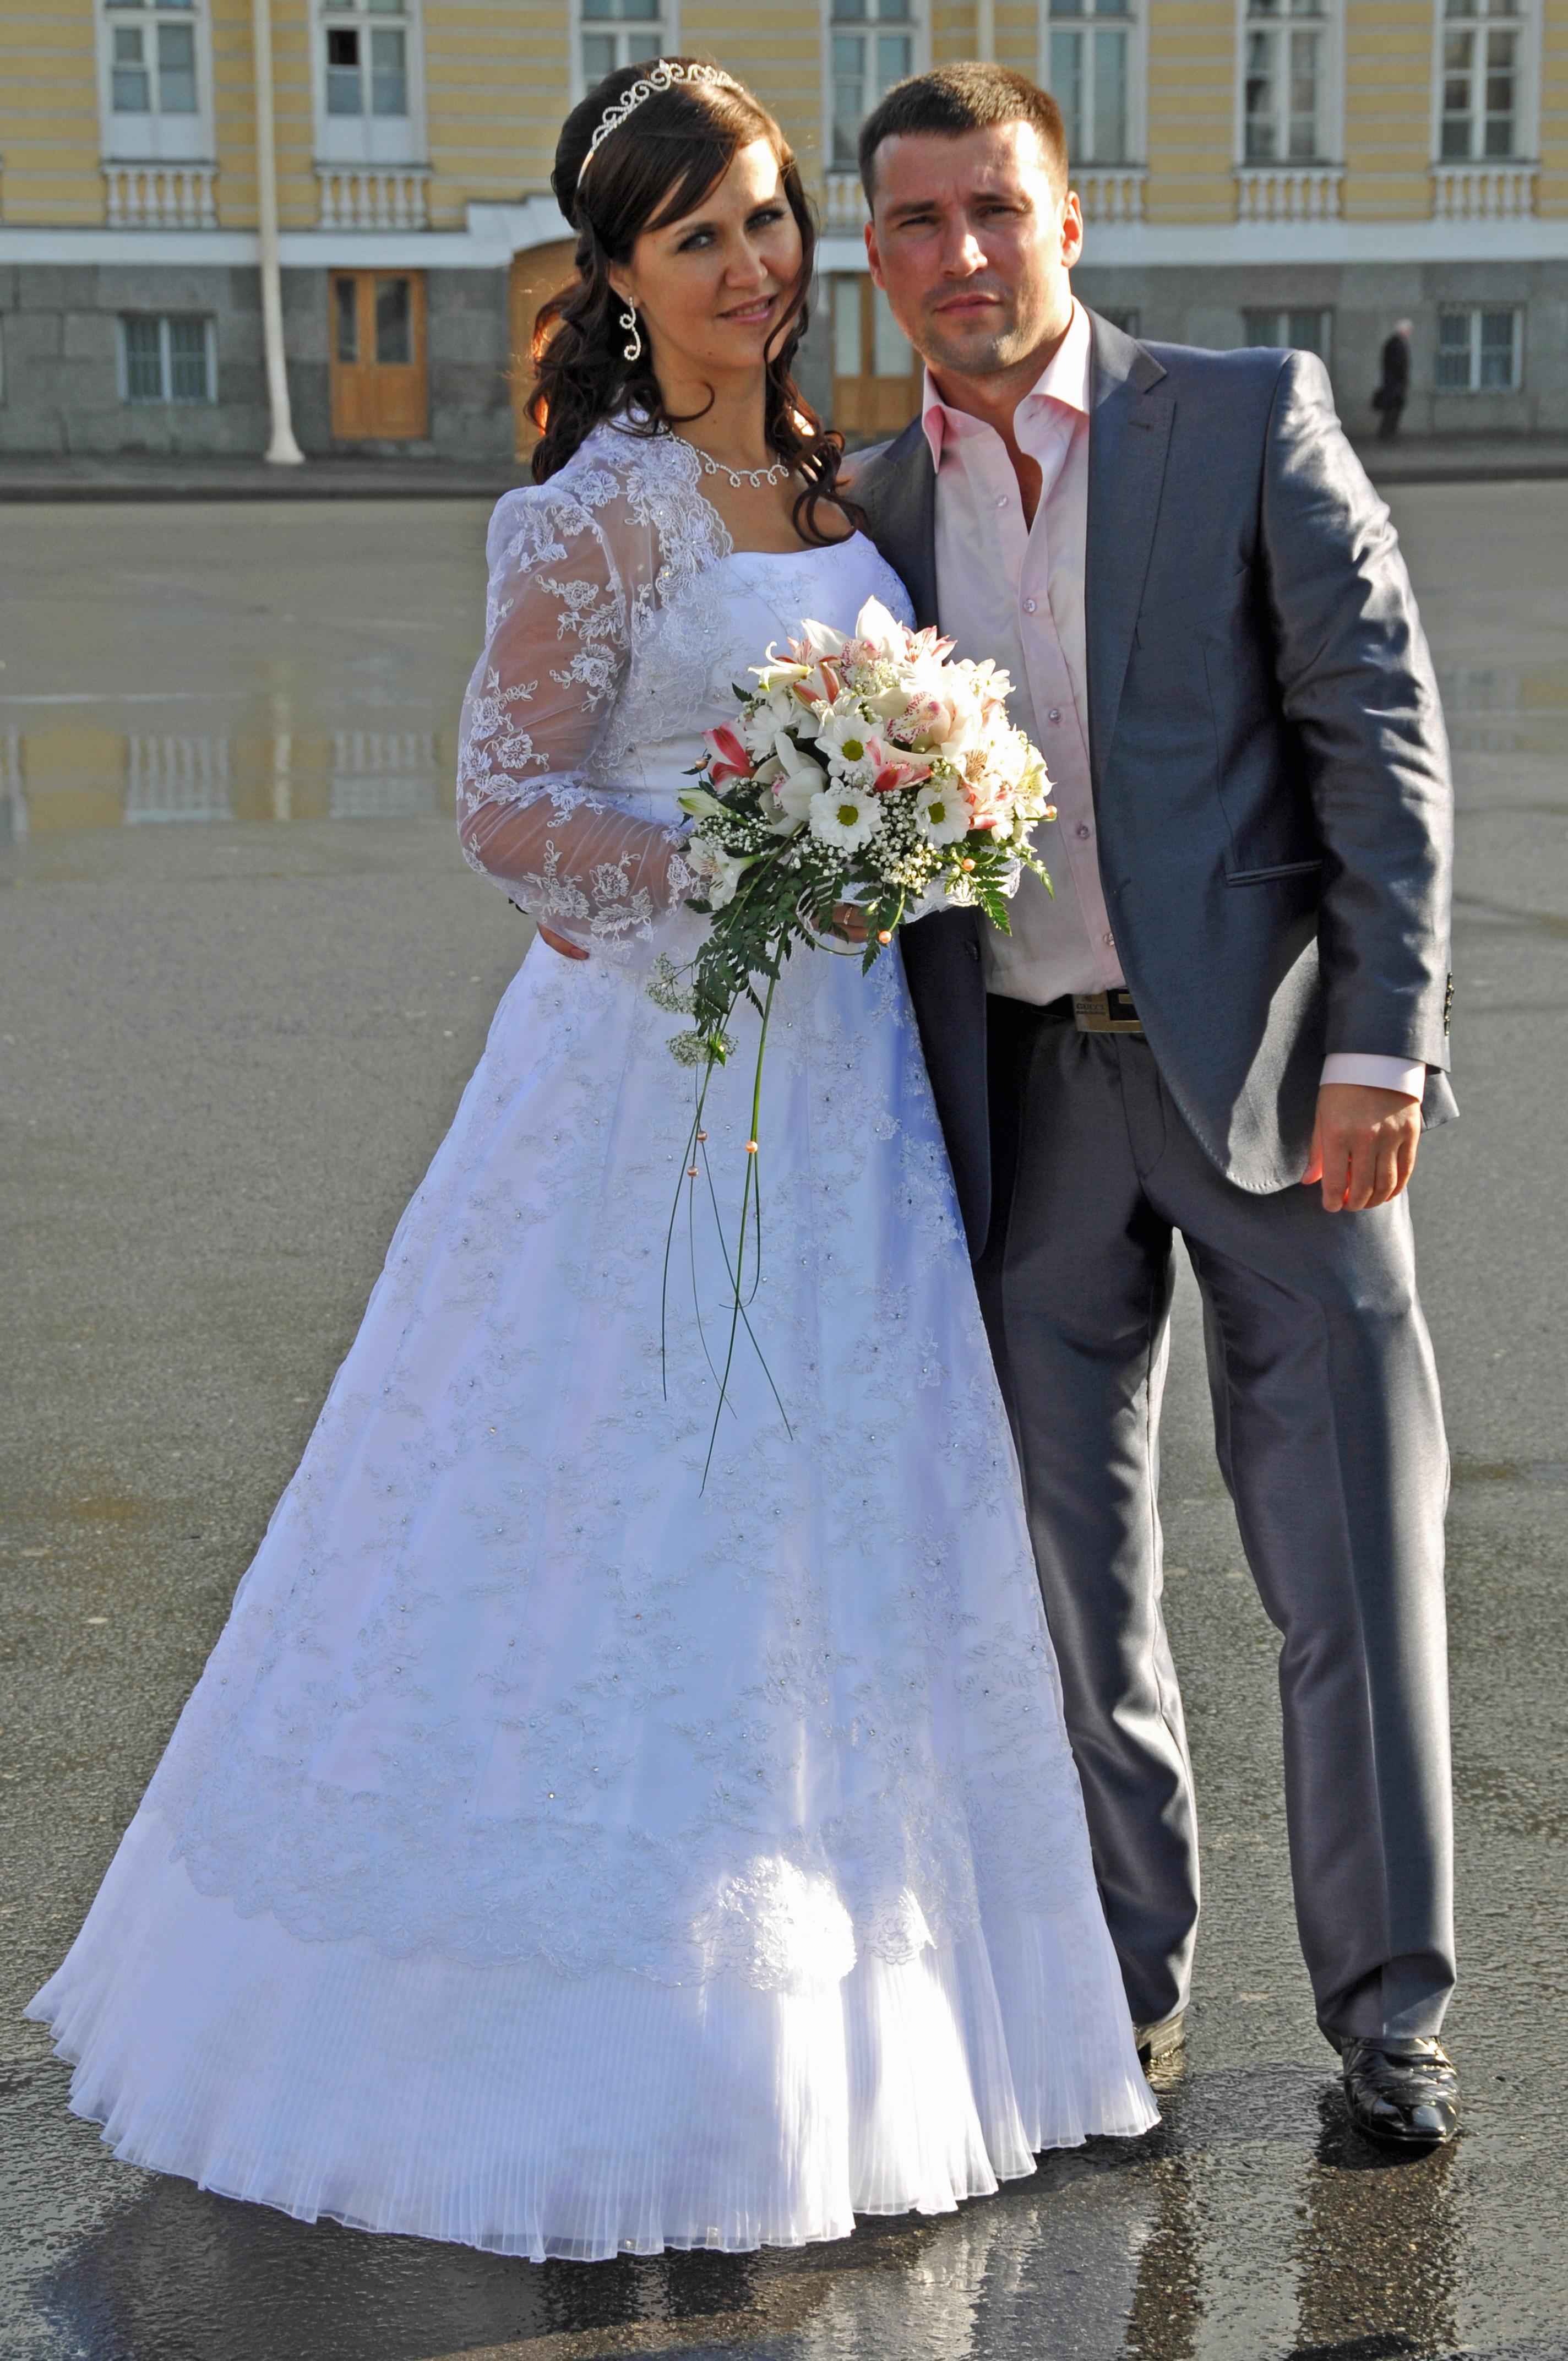 Russian Wedded Couple   Saint Petersburg%2C Russia   Sept. 2009 - Weddings Around The World